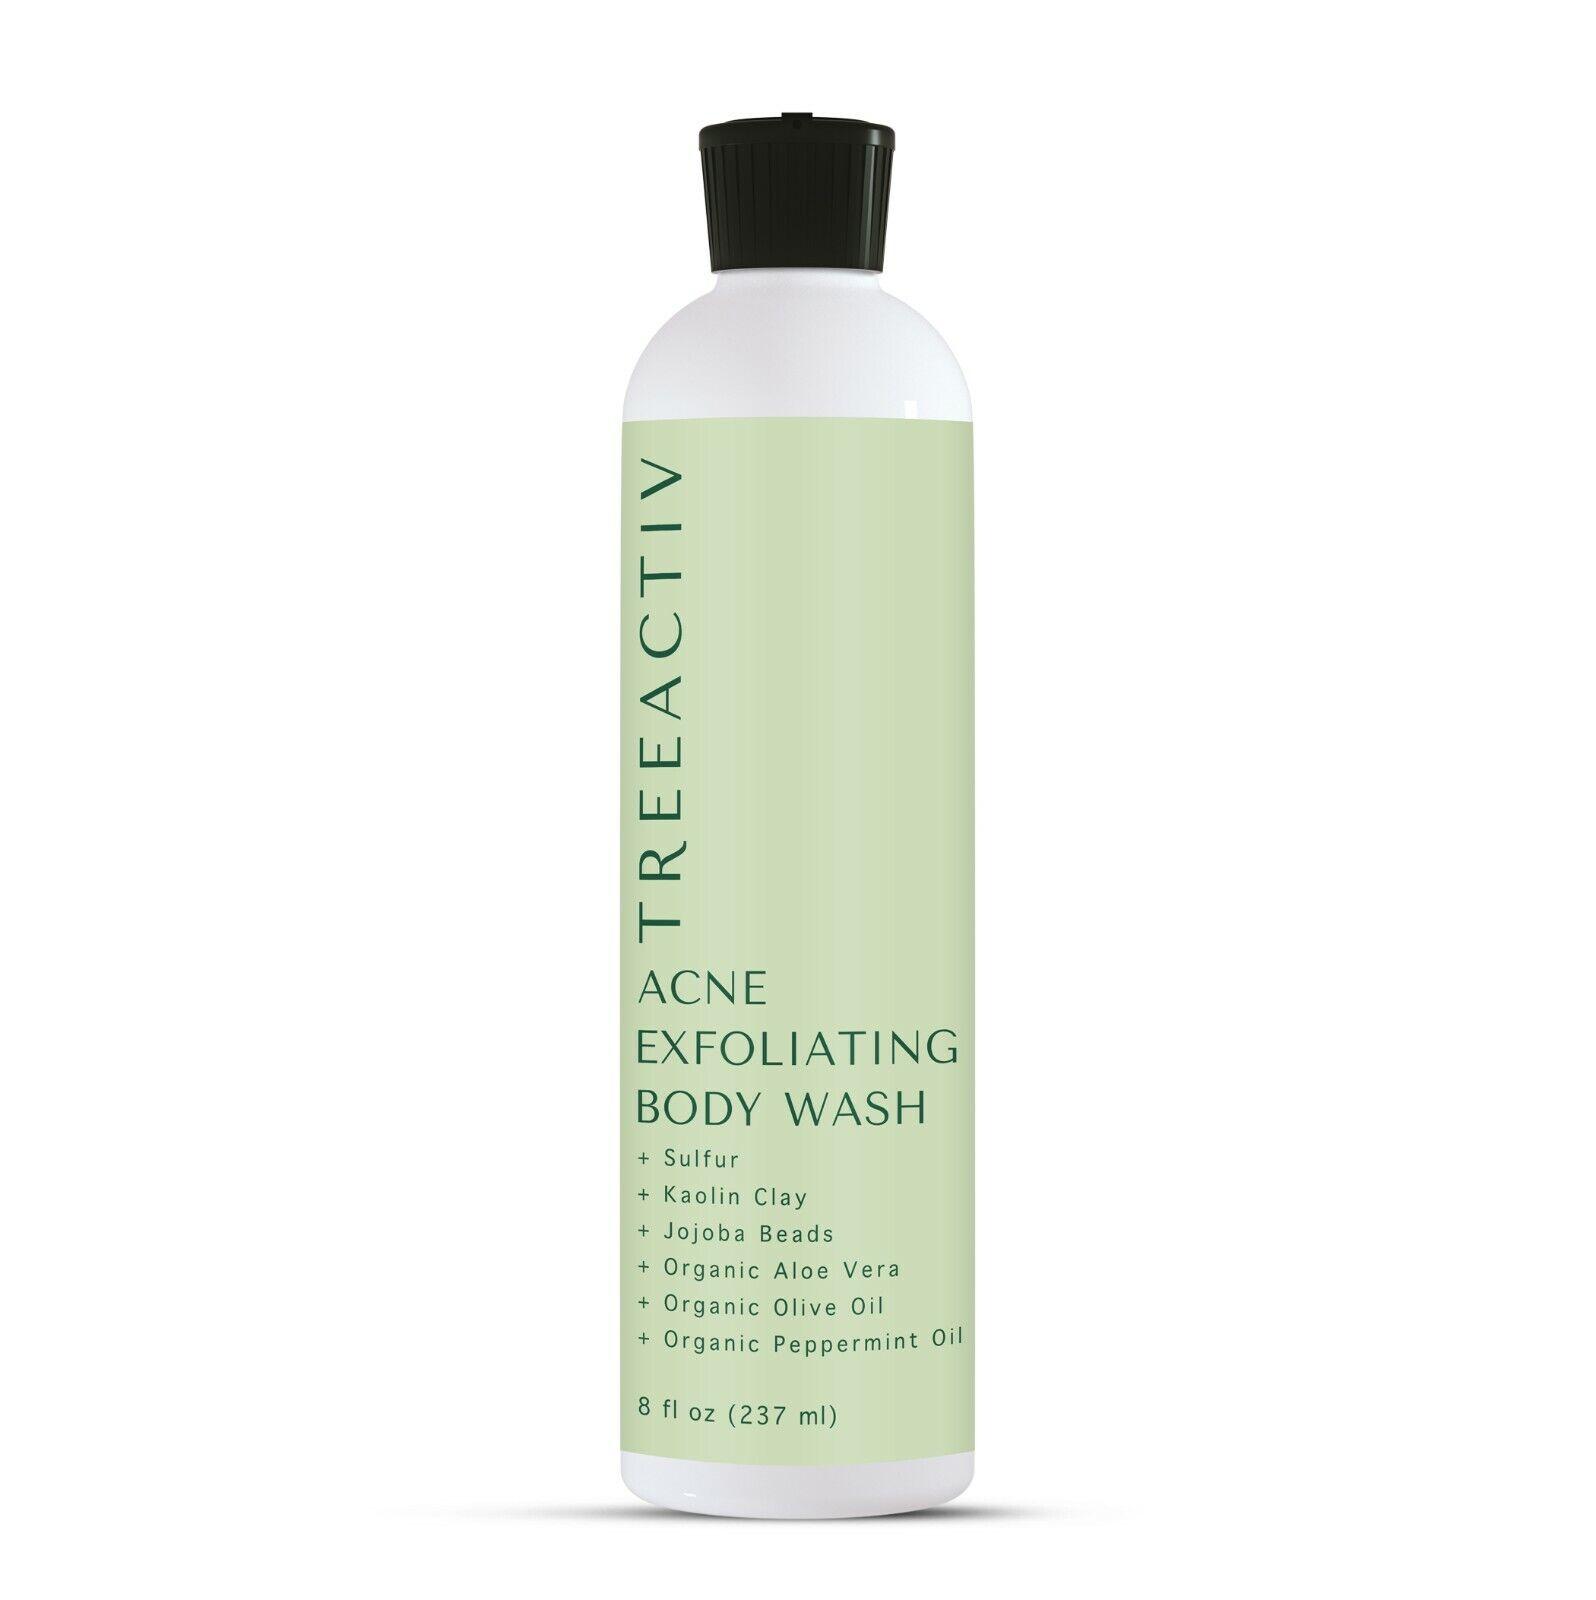 TreeActiv Acne Exfoliating Body Wash | Natural Treatment for